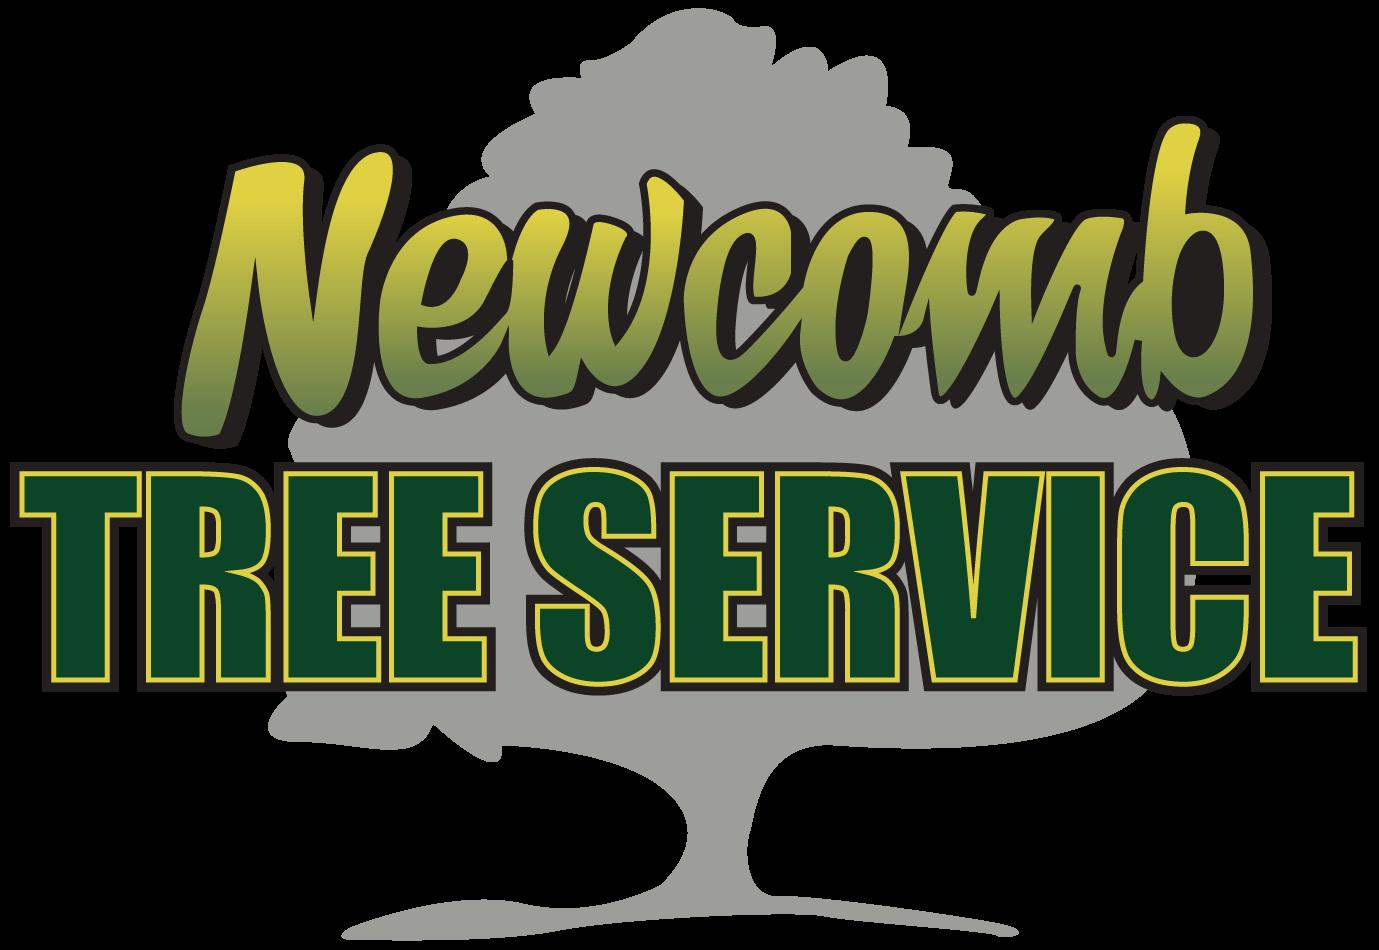 Newcomb Tree Service logo